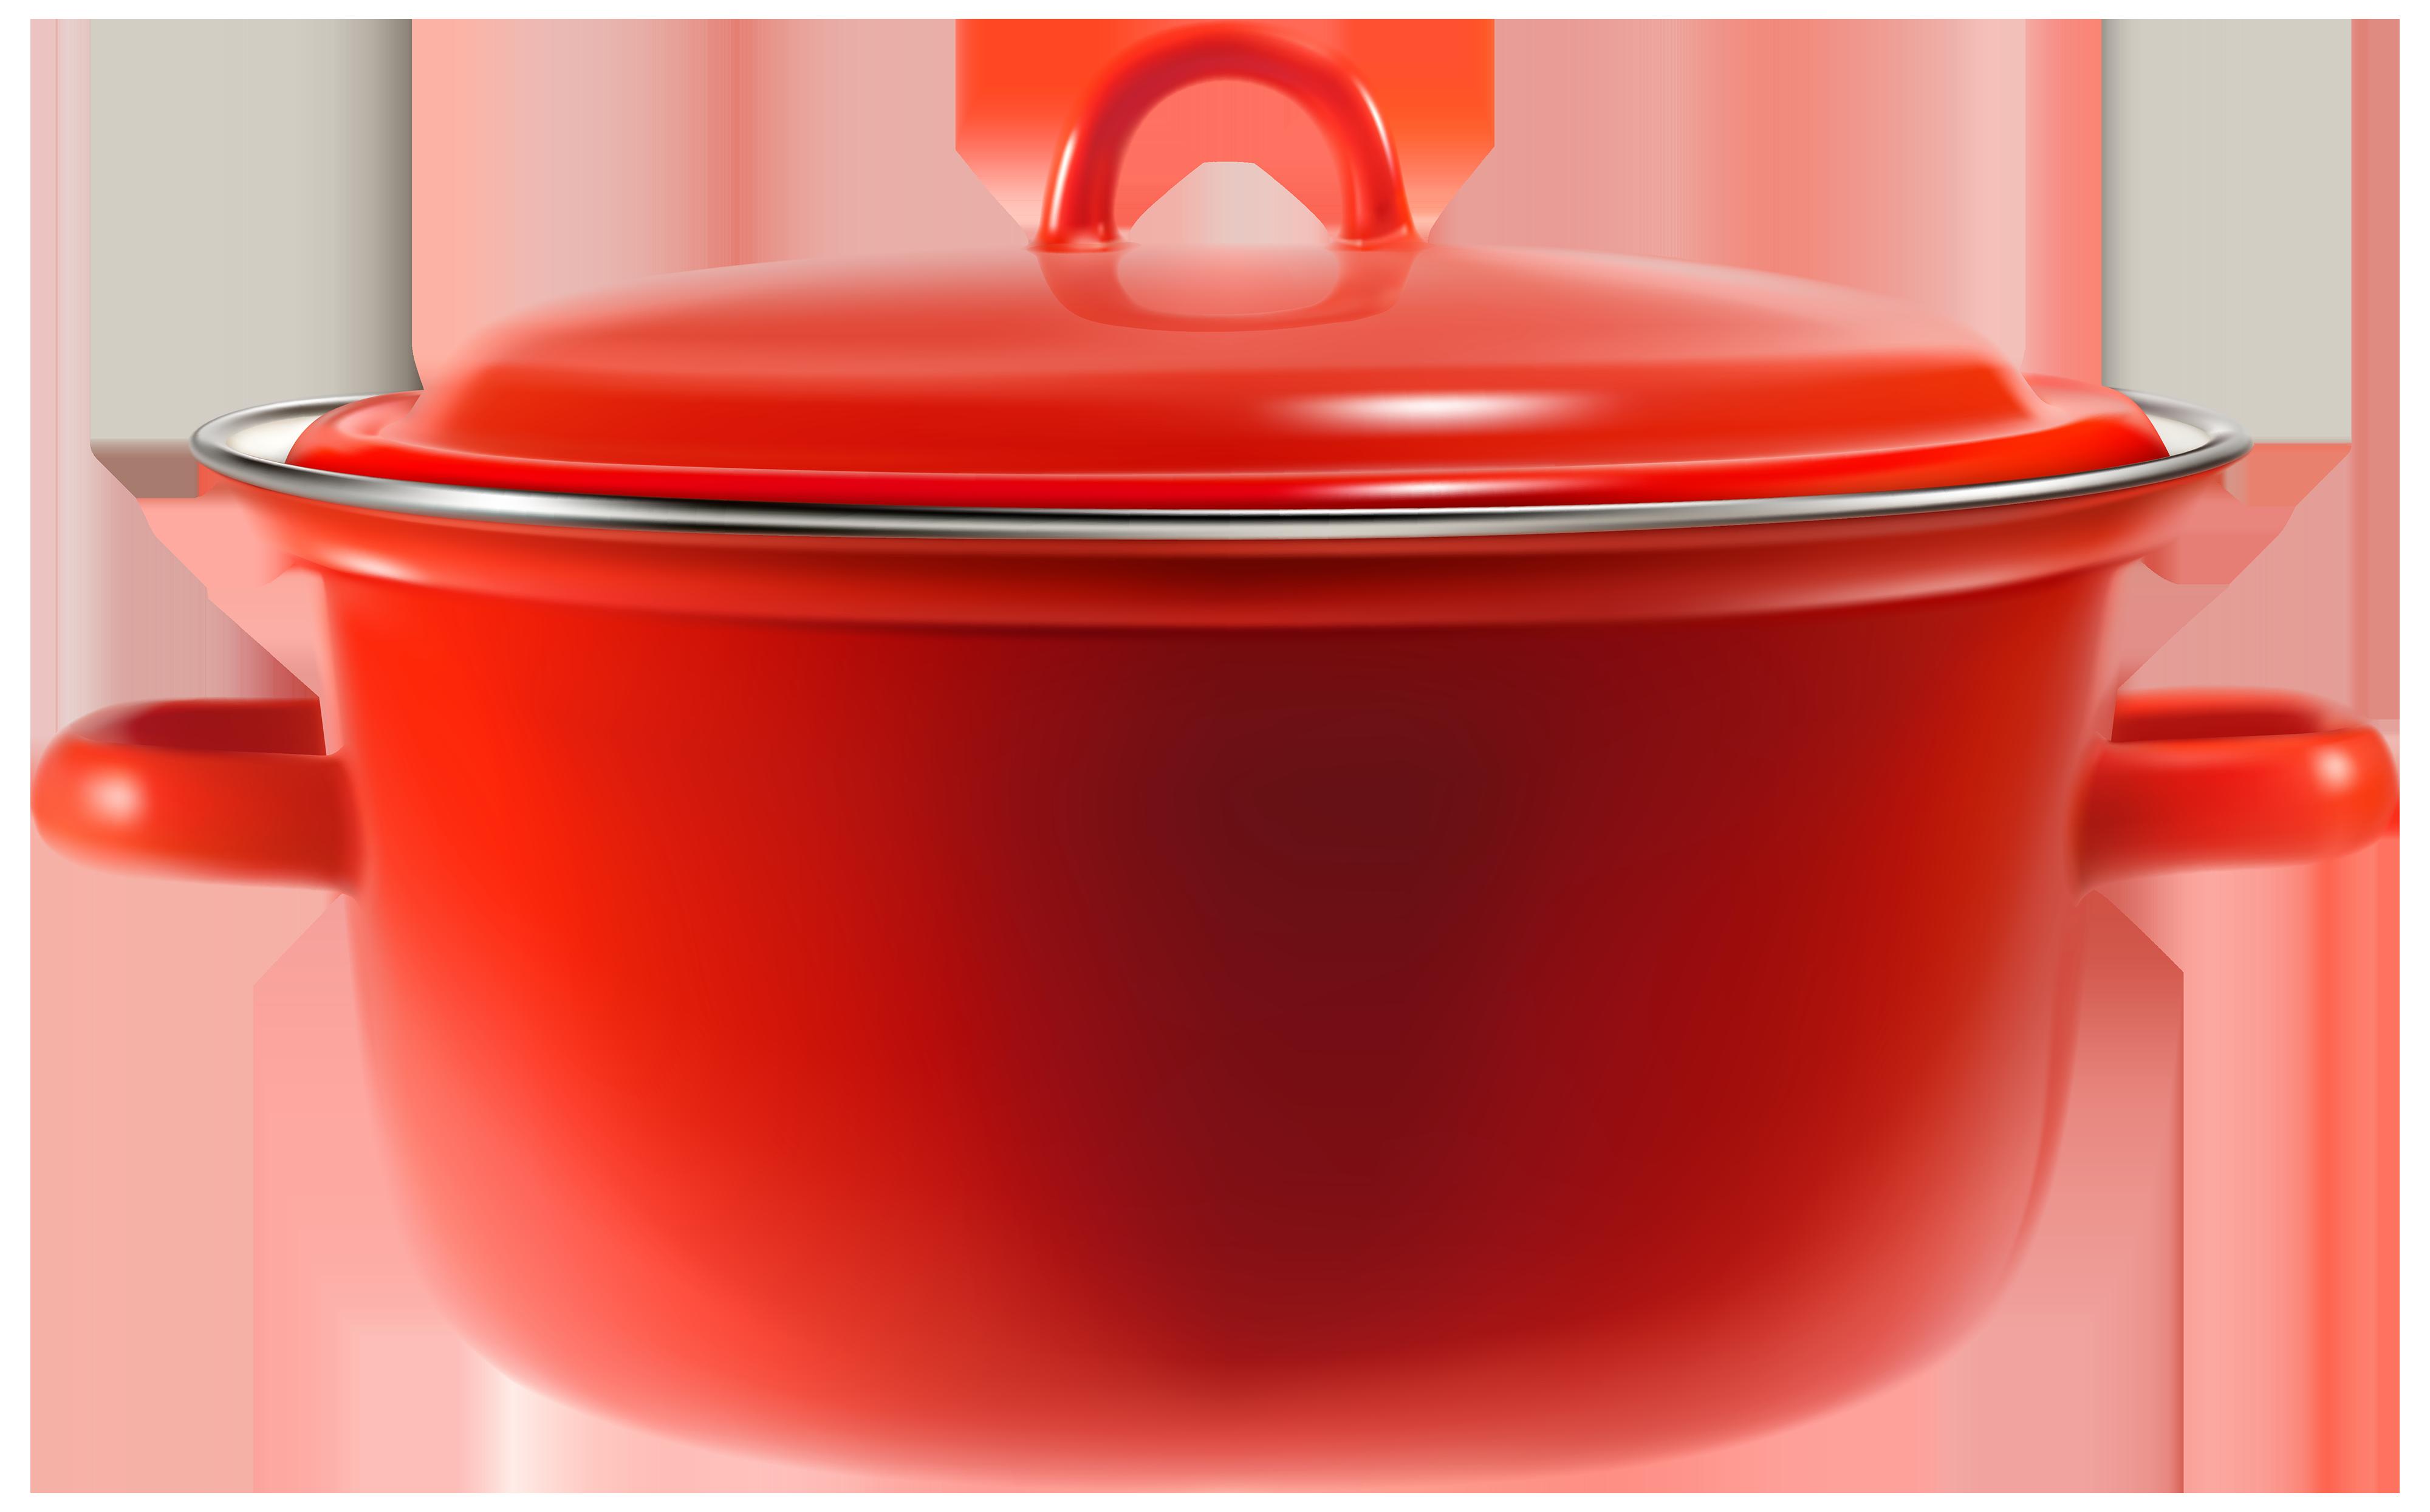 Cooking Pot Png - Pot, Transparent background PNG HD thumbnail